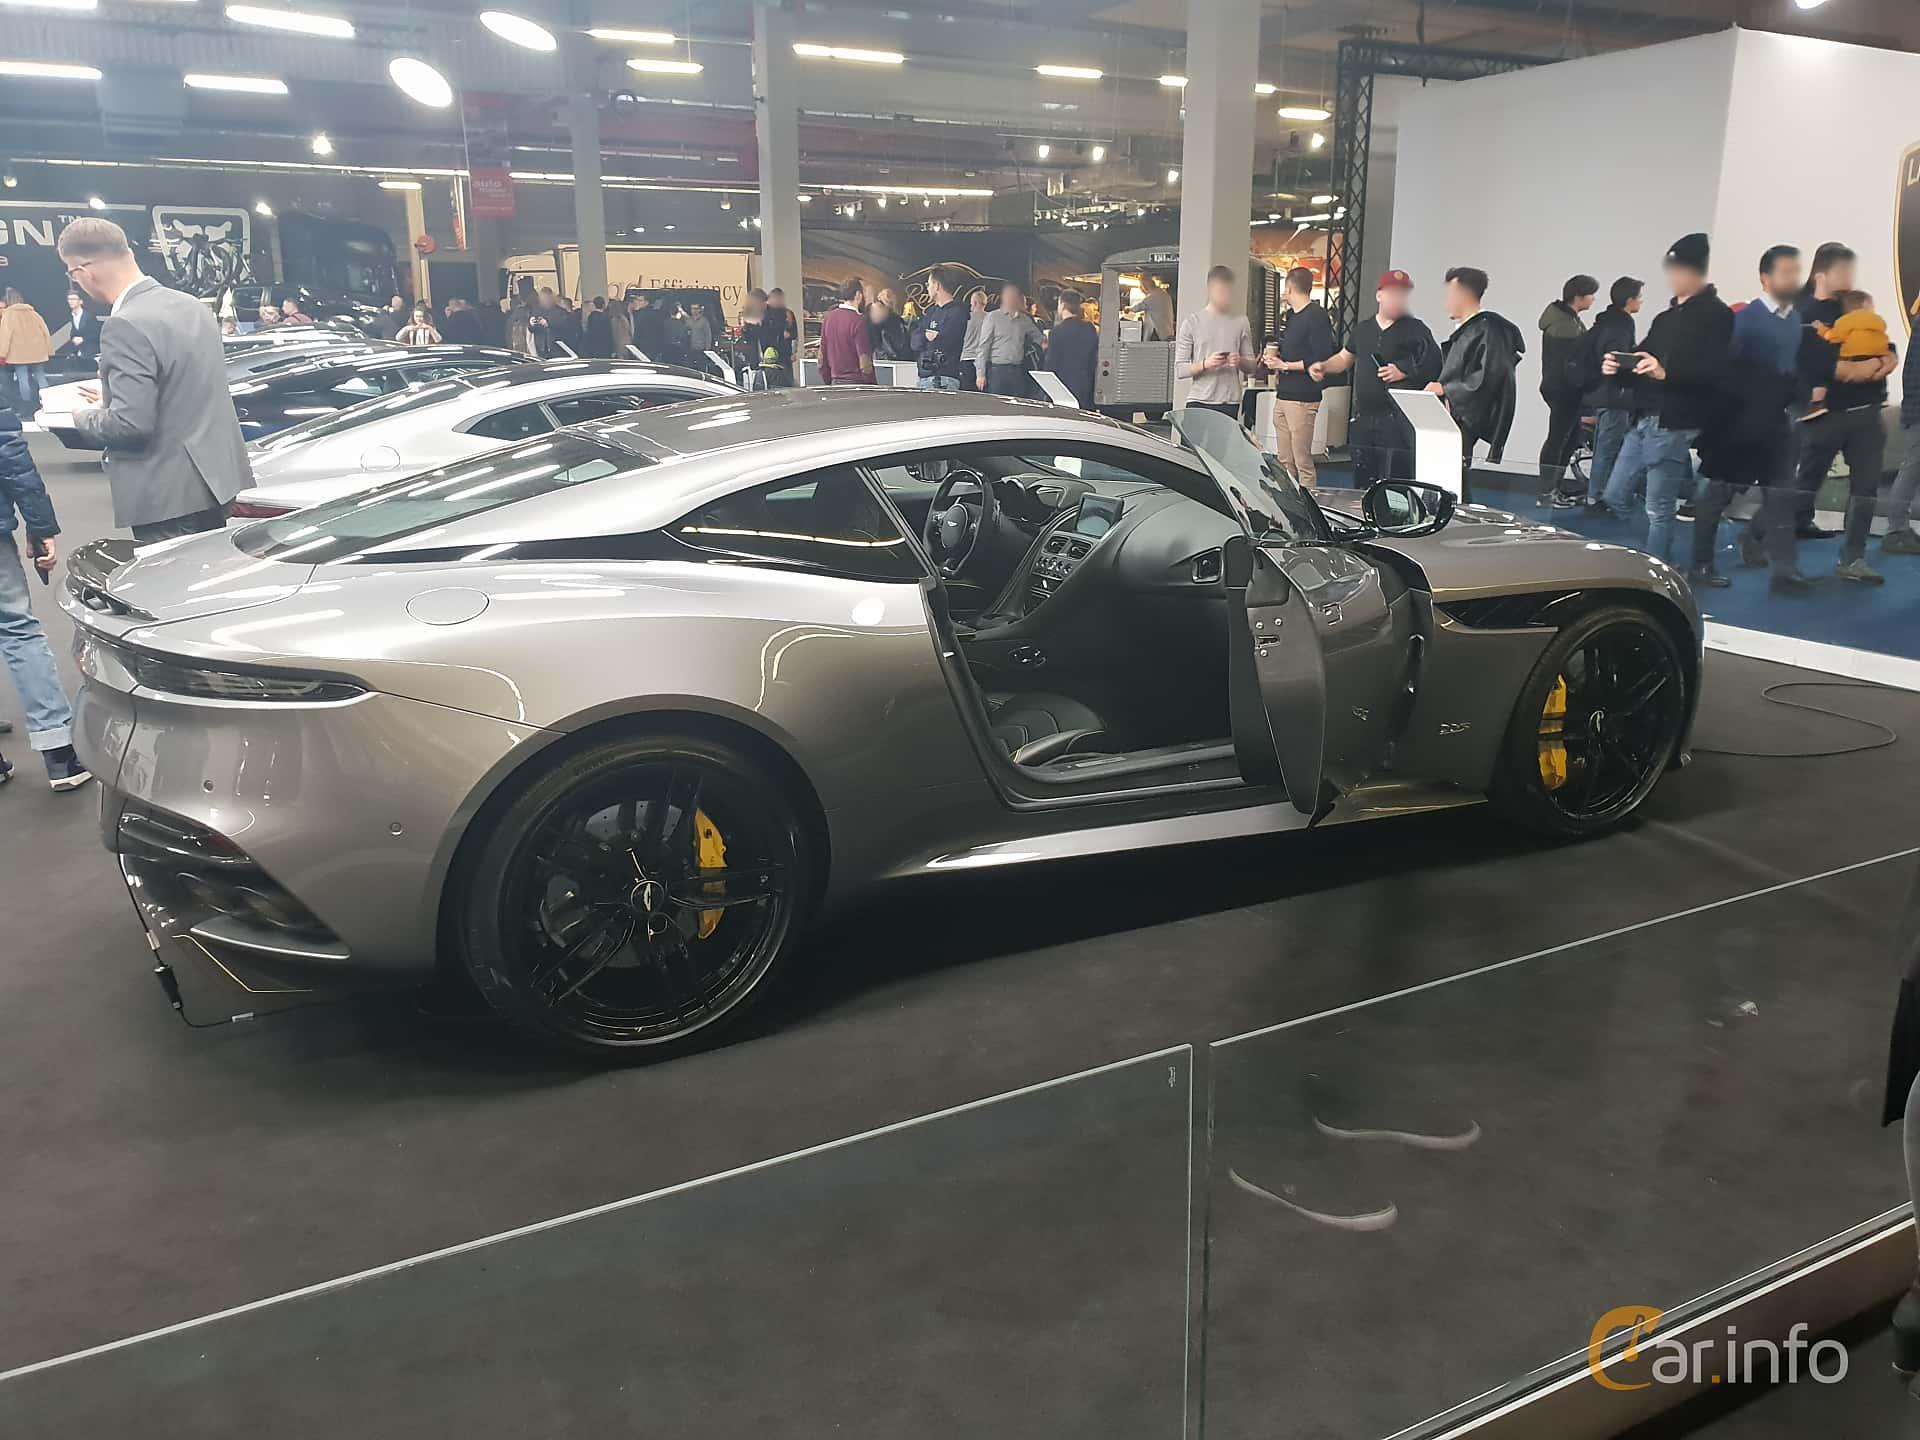 Aston Martin DBS Superleggera 5.2 V12 Automatisk, 725hk, 2018 at Warsawa Motorshow 2018